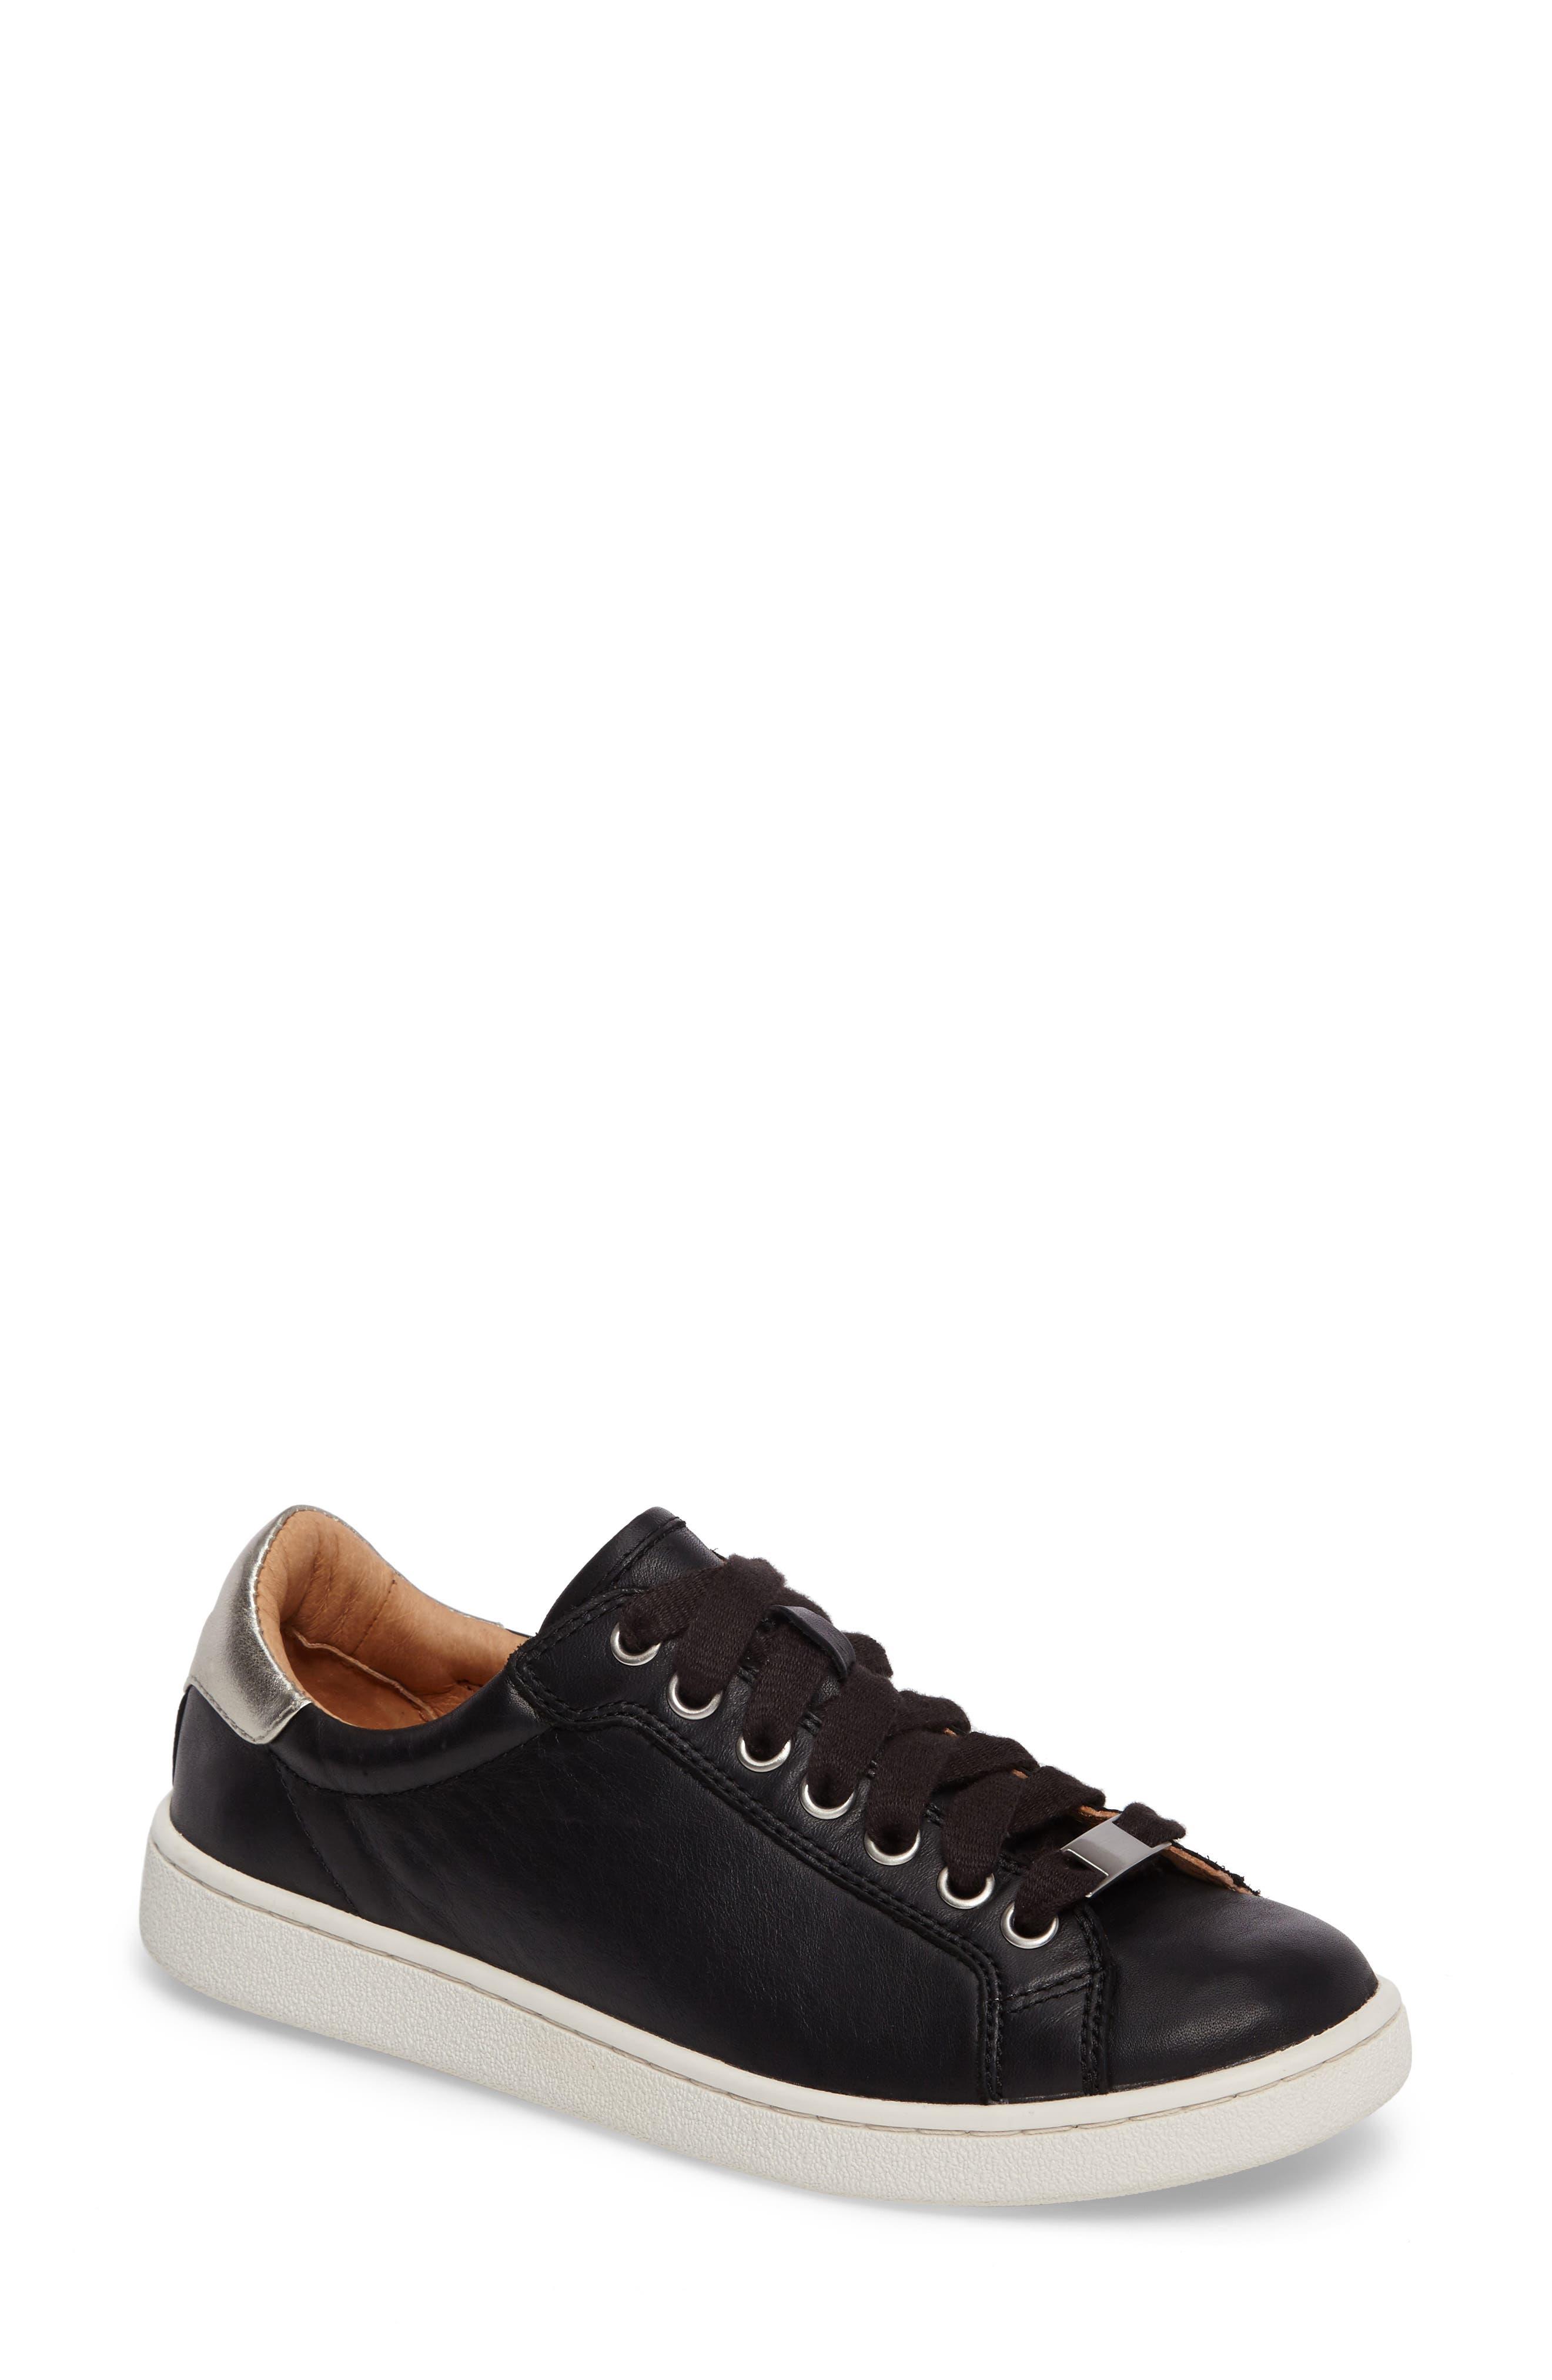 UGG | Milo Leather Sneaker | Nordstrom Rack